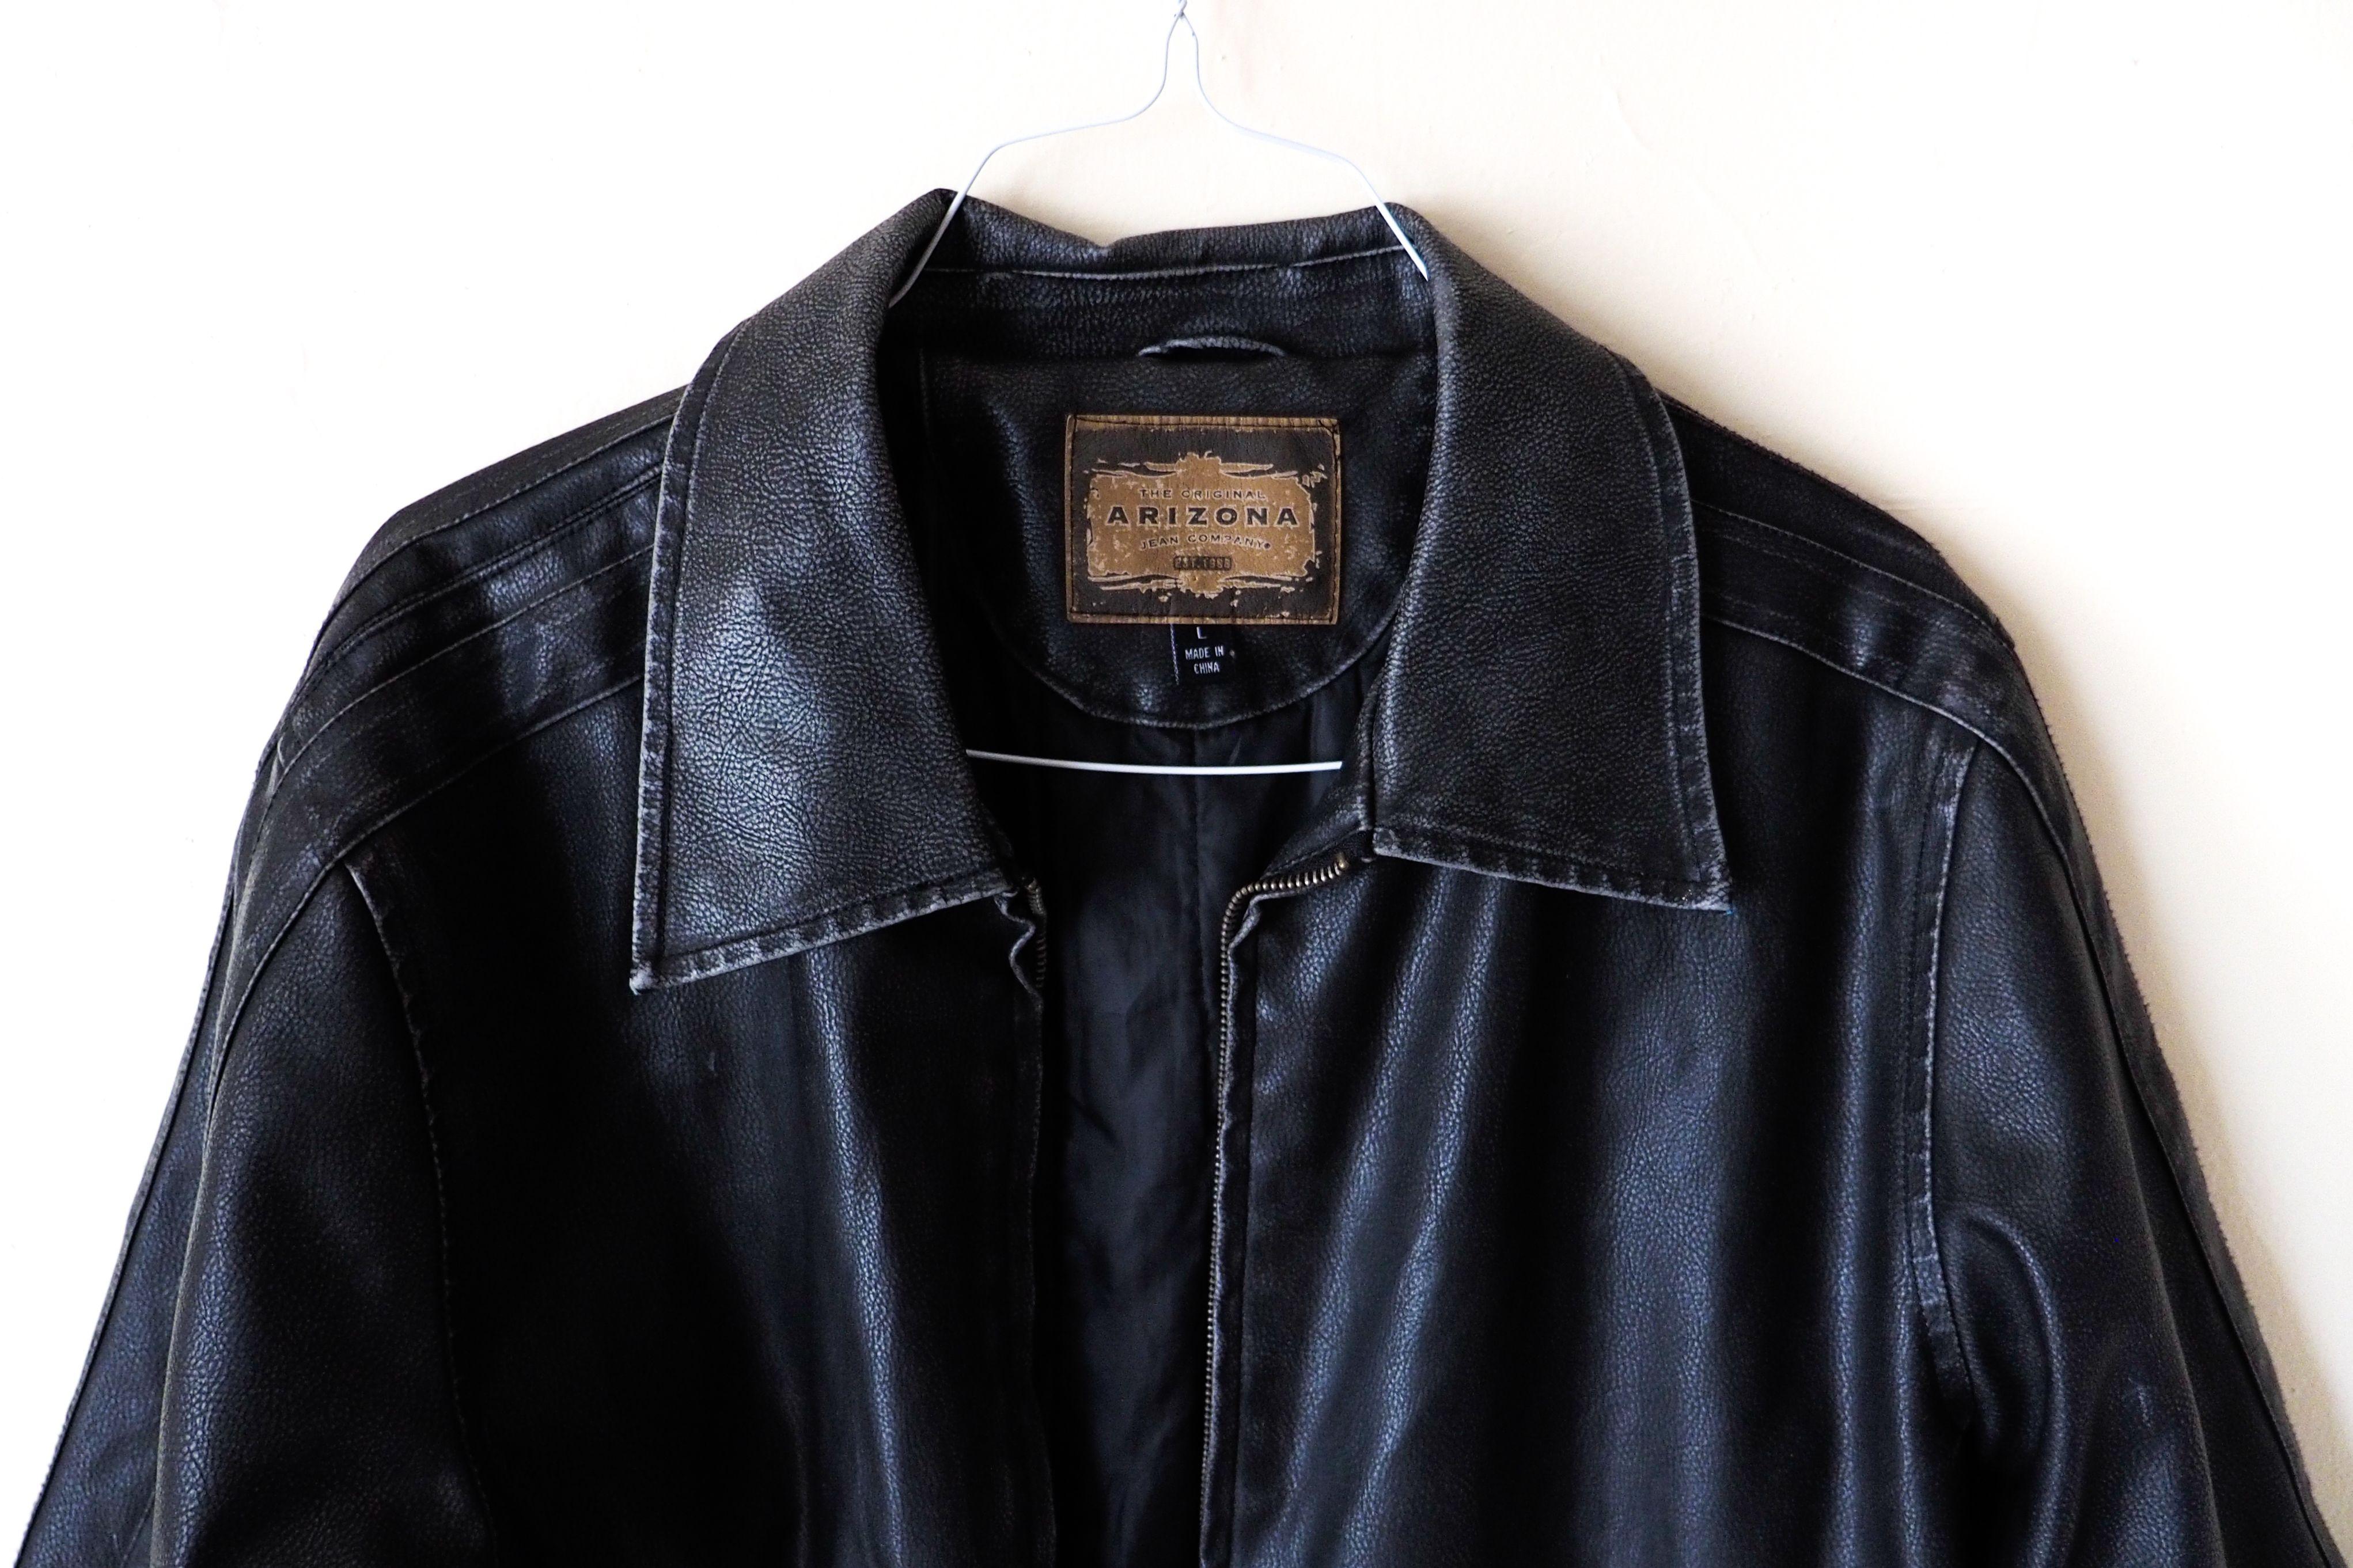 Arizona Original Leather Jacket Mens Black Biker Large Vintage Motor Punk Oversized Hippie Western Hipster Coat Leather Jacket Men Hipster Coat Leather Jacket